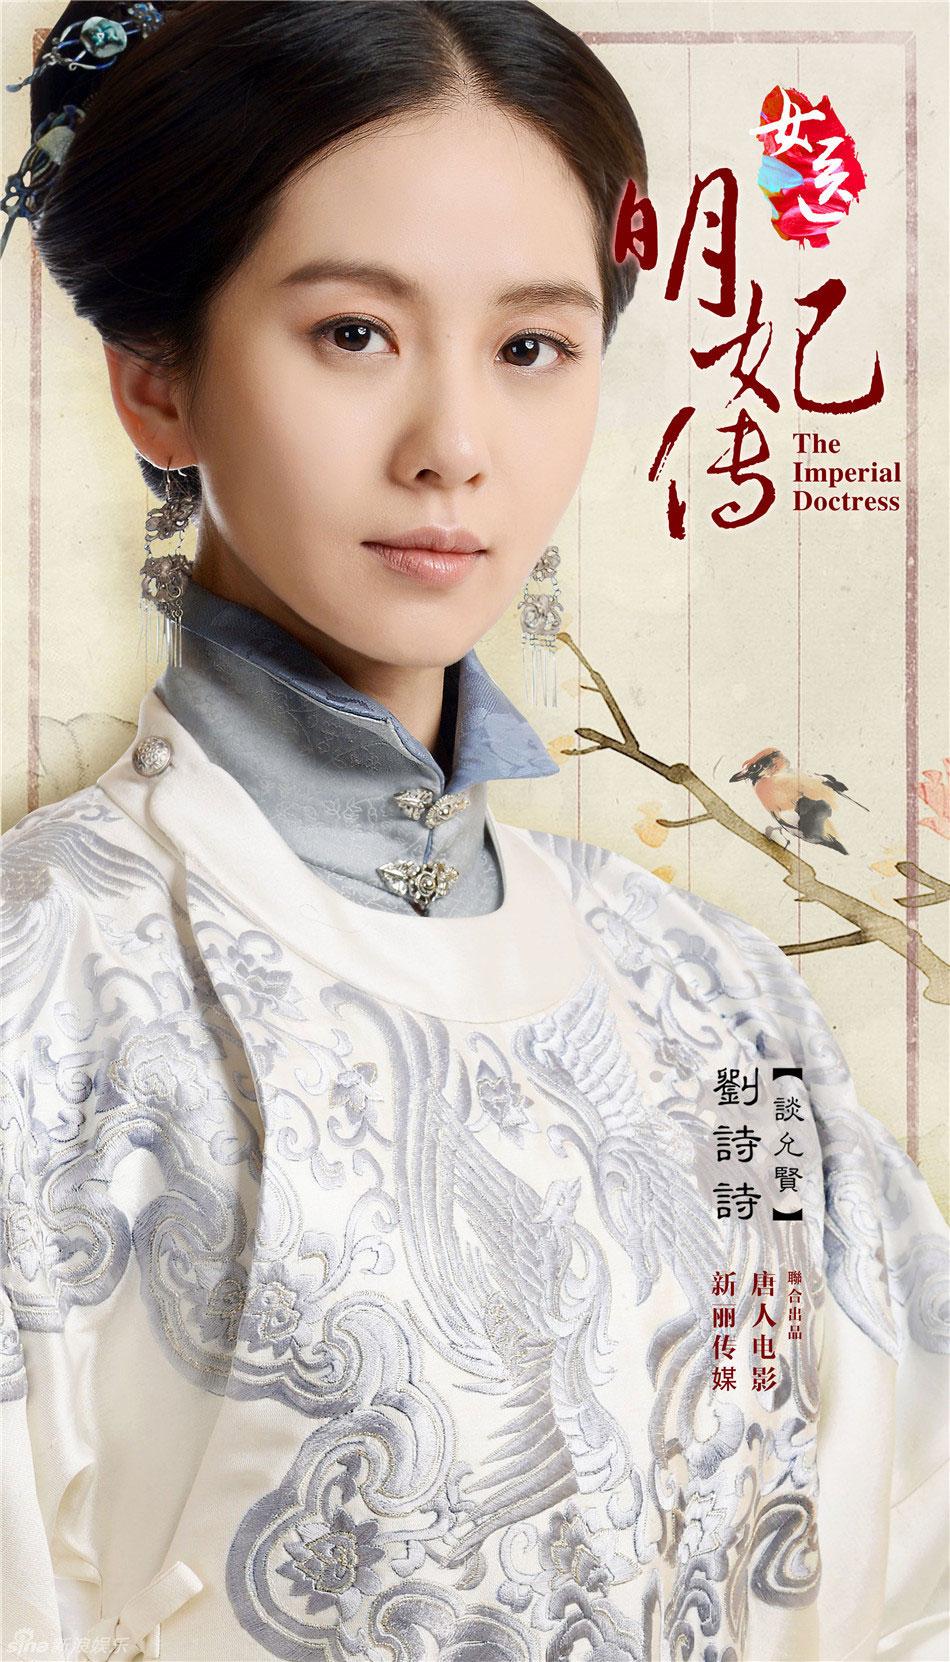 Liu Shishi Imperial Doctress Chinese drama